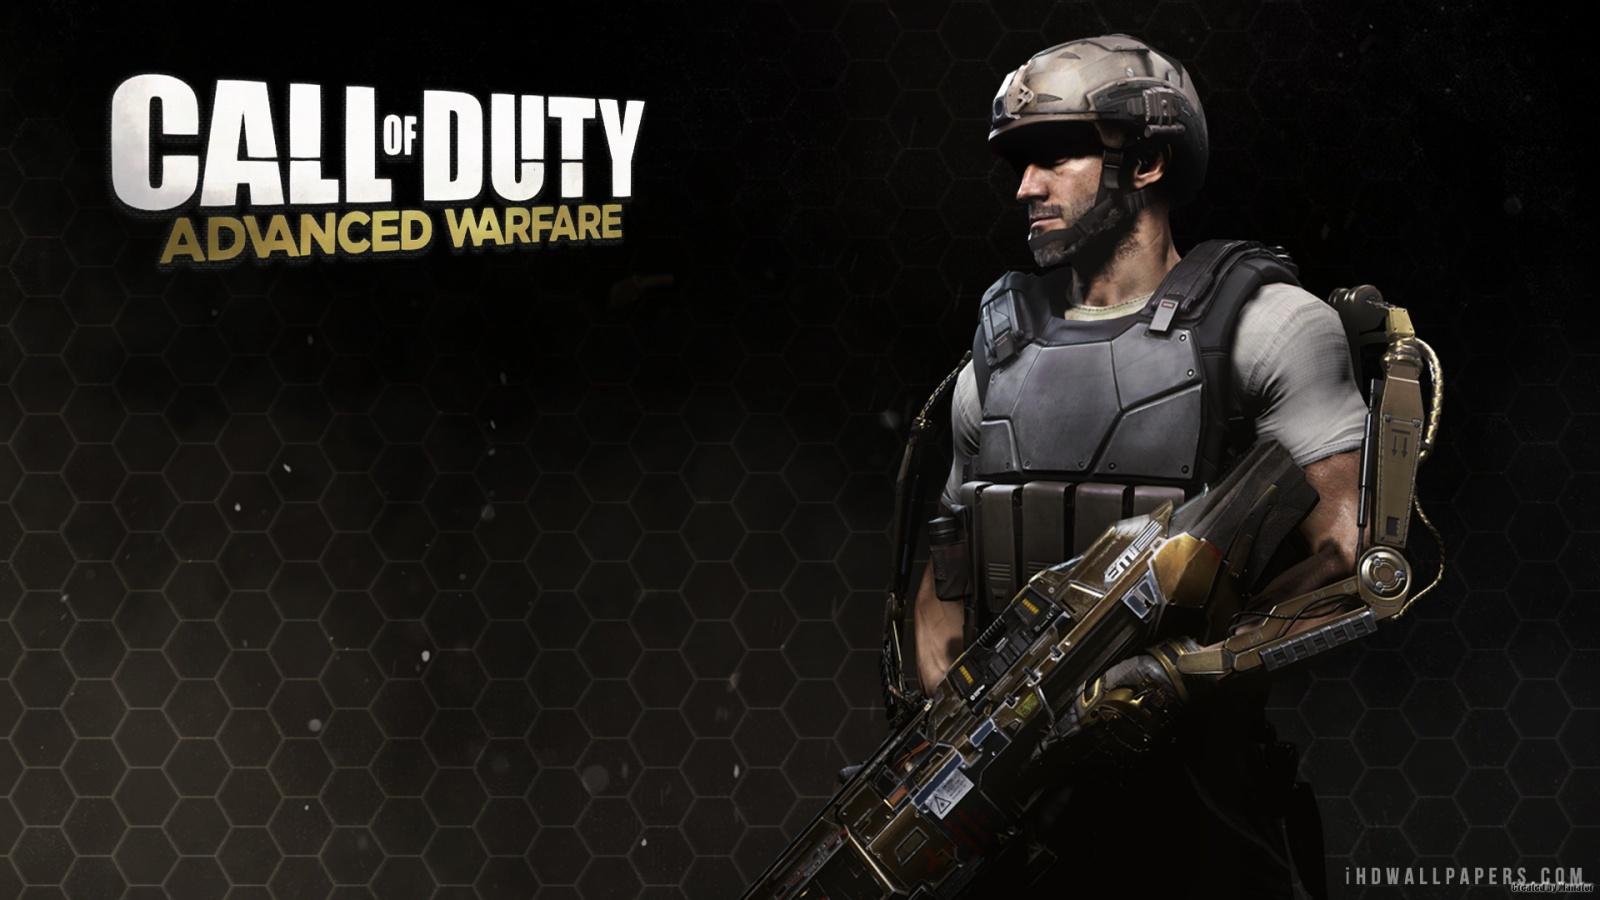 Call Of Duty Advanced Warfare Wallpapers: Advanced Warfare Wallpaper HD